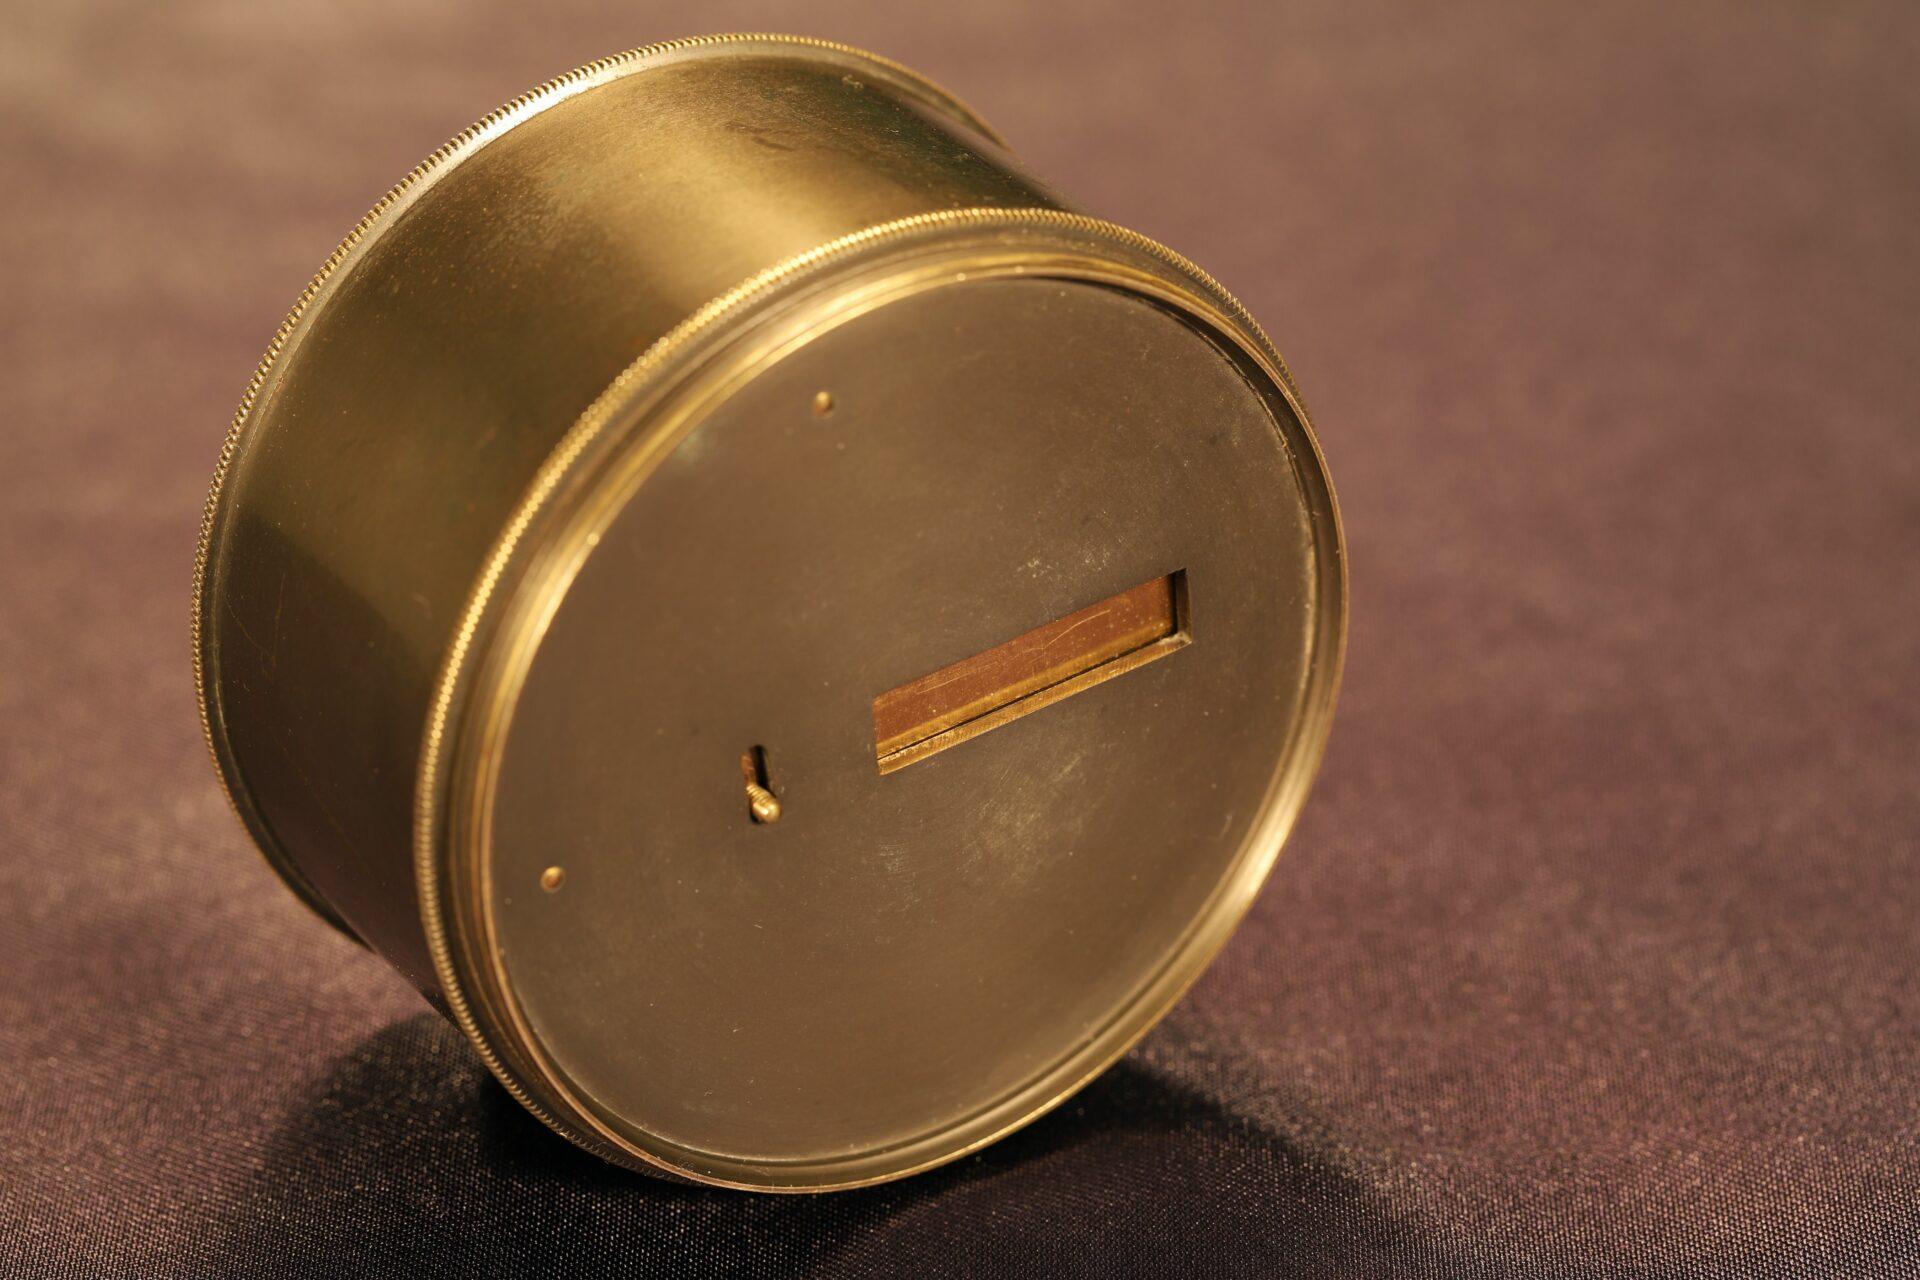 Image of bottom of Oxidised Brass Pocket Sextant c1890